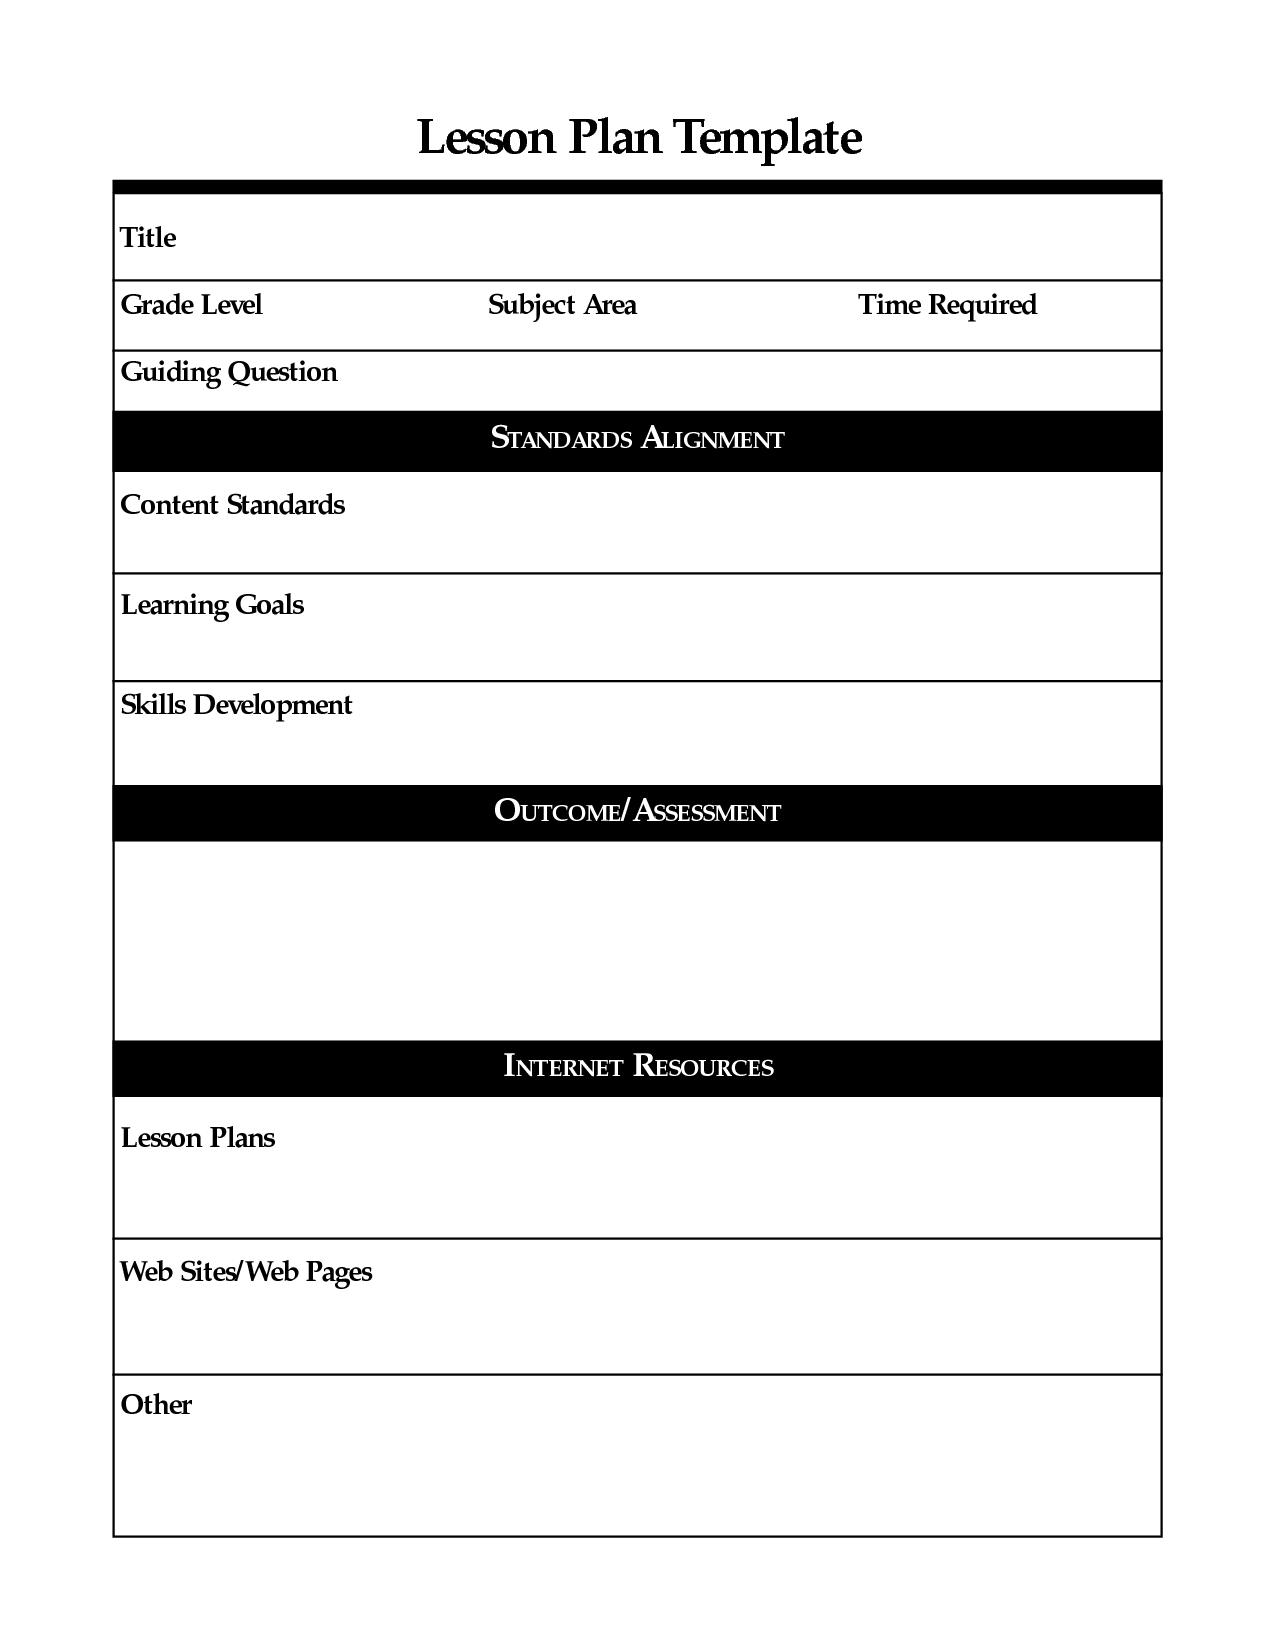 Printable Lesson Plan Template, Free To Download - Free Printable Blank Lesson Plan Pages